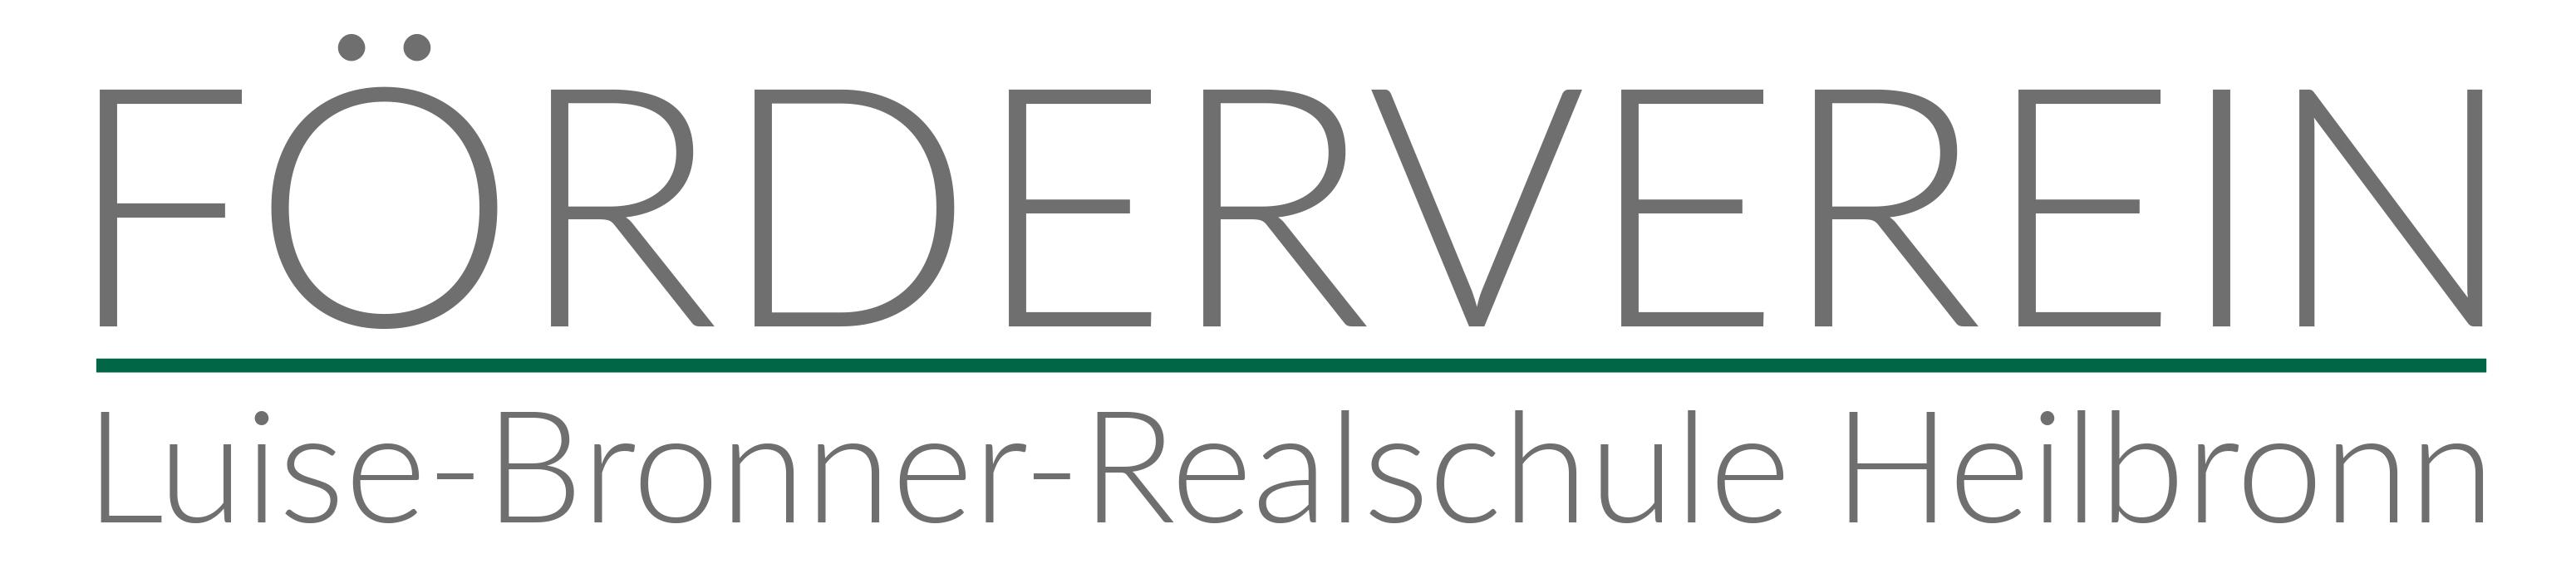 Förderverein der Luise-Bronner-Realschule Heilbronn